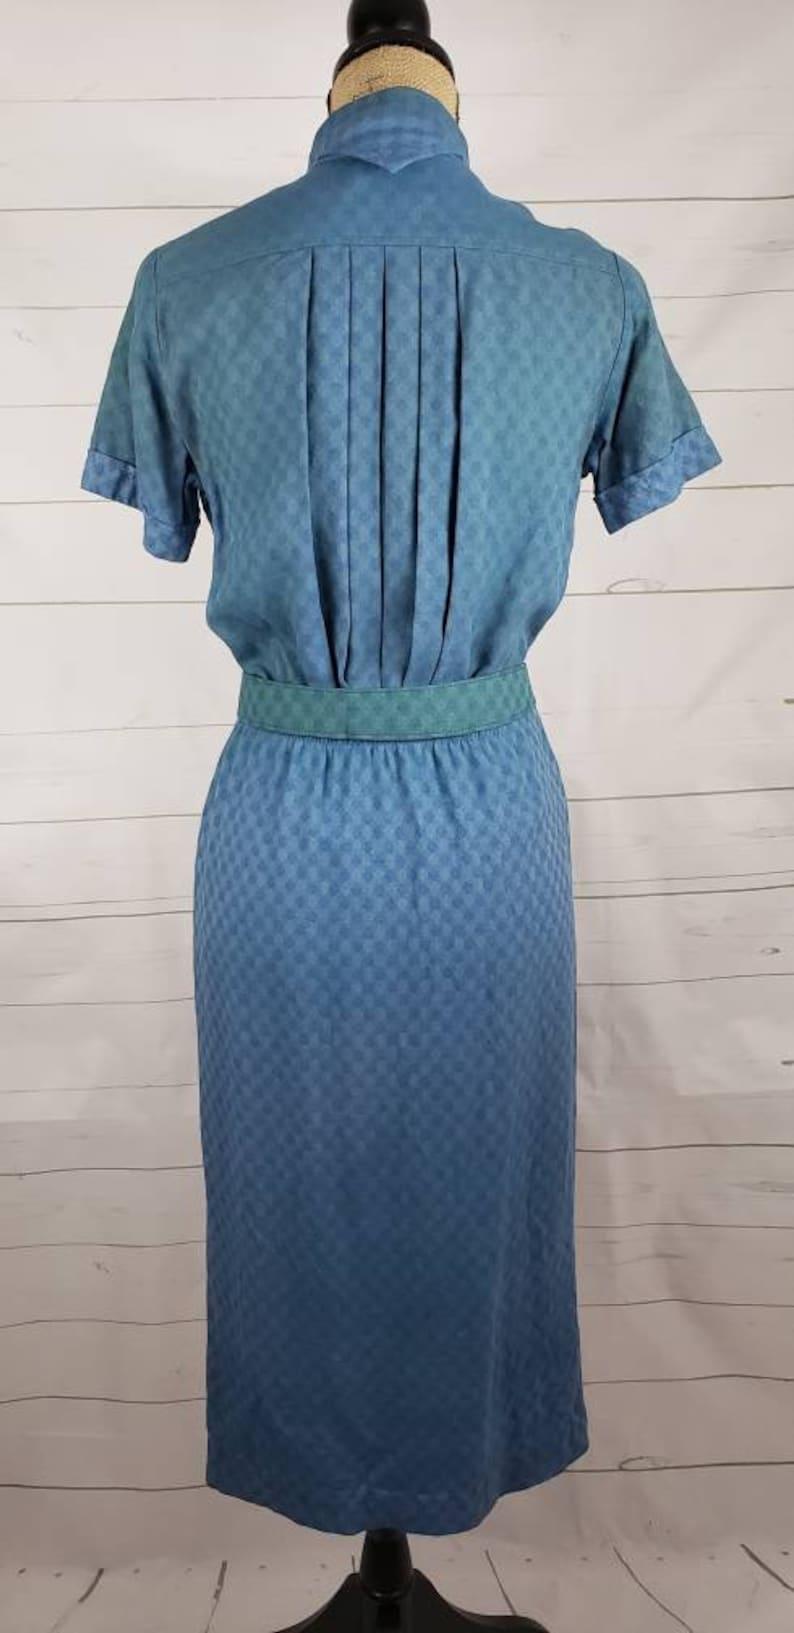 Vintage Dress  Retro Dress  1950/'s Dress  1960/'s Dress  Gingham Dress  Plaid Dress  Blue Dress  Green Dress  Day Dress  House Dress